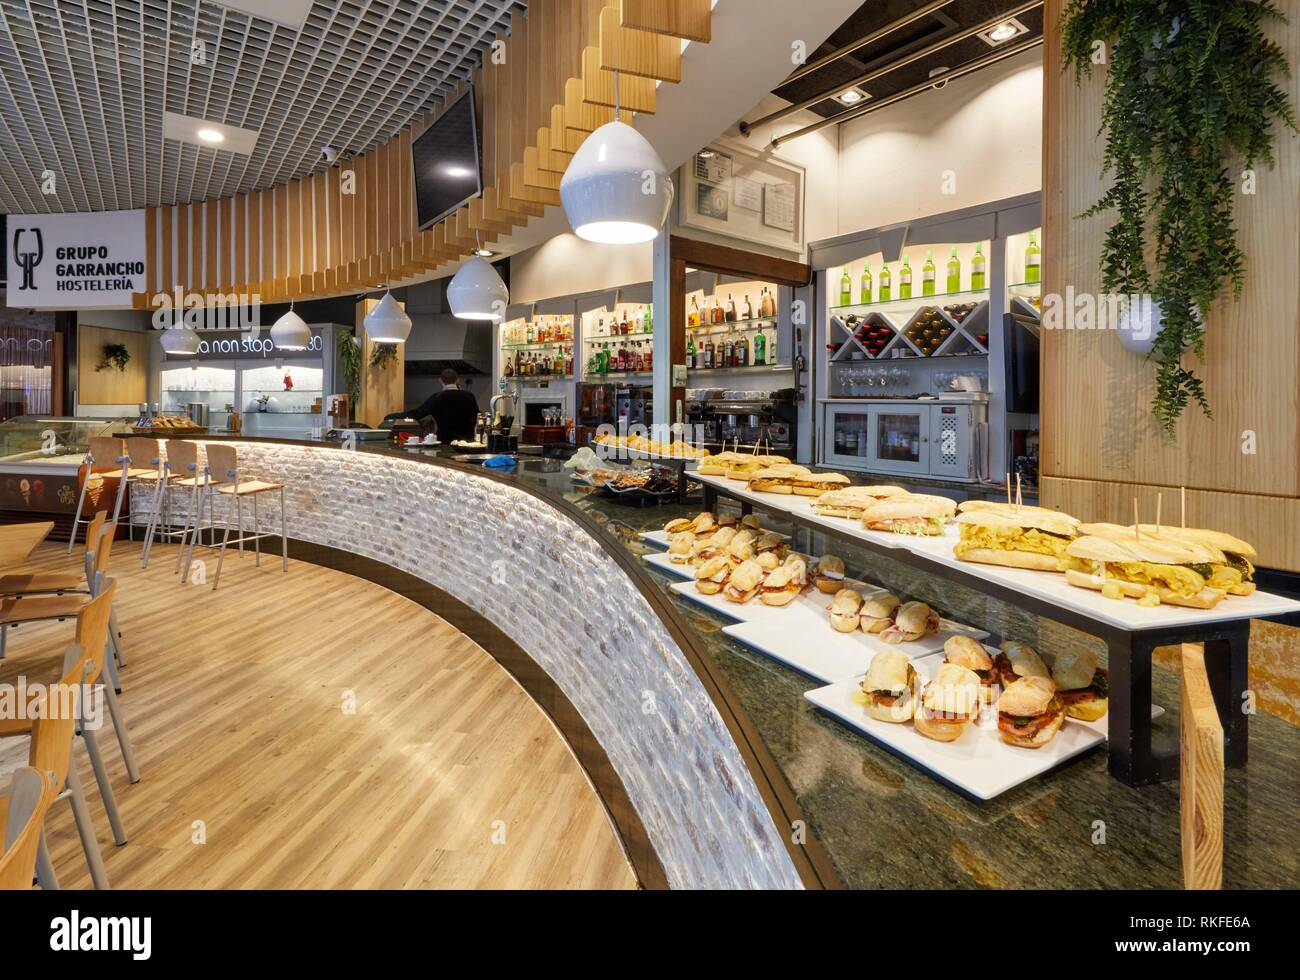 Bar à pintxos, Restaurante Bar Virginia Mendibil Spéciaux & Fast Good, Mall, Centre Commercial Mendibil, Irun, Gipuzkoa, Pays Basque, Espagne Banque D'Images